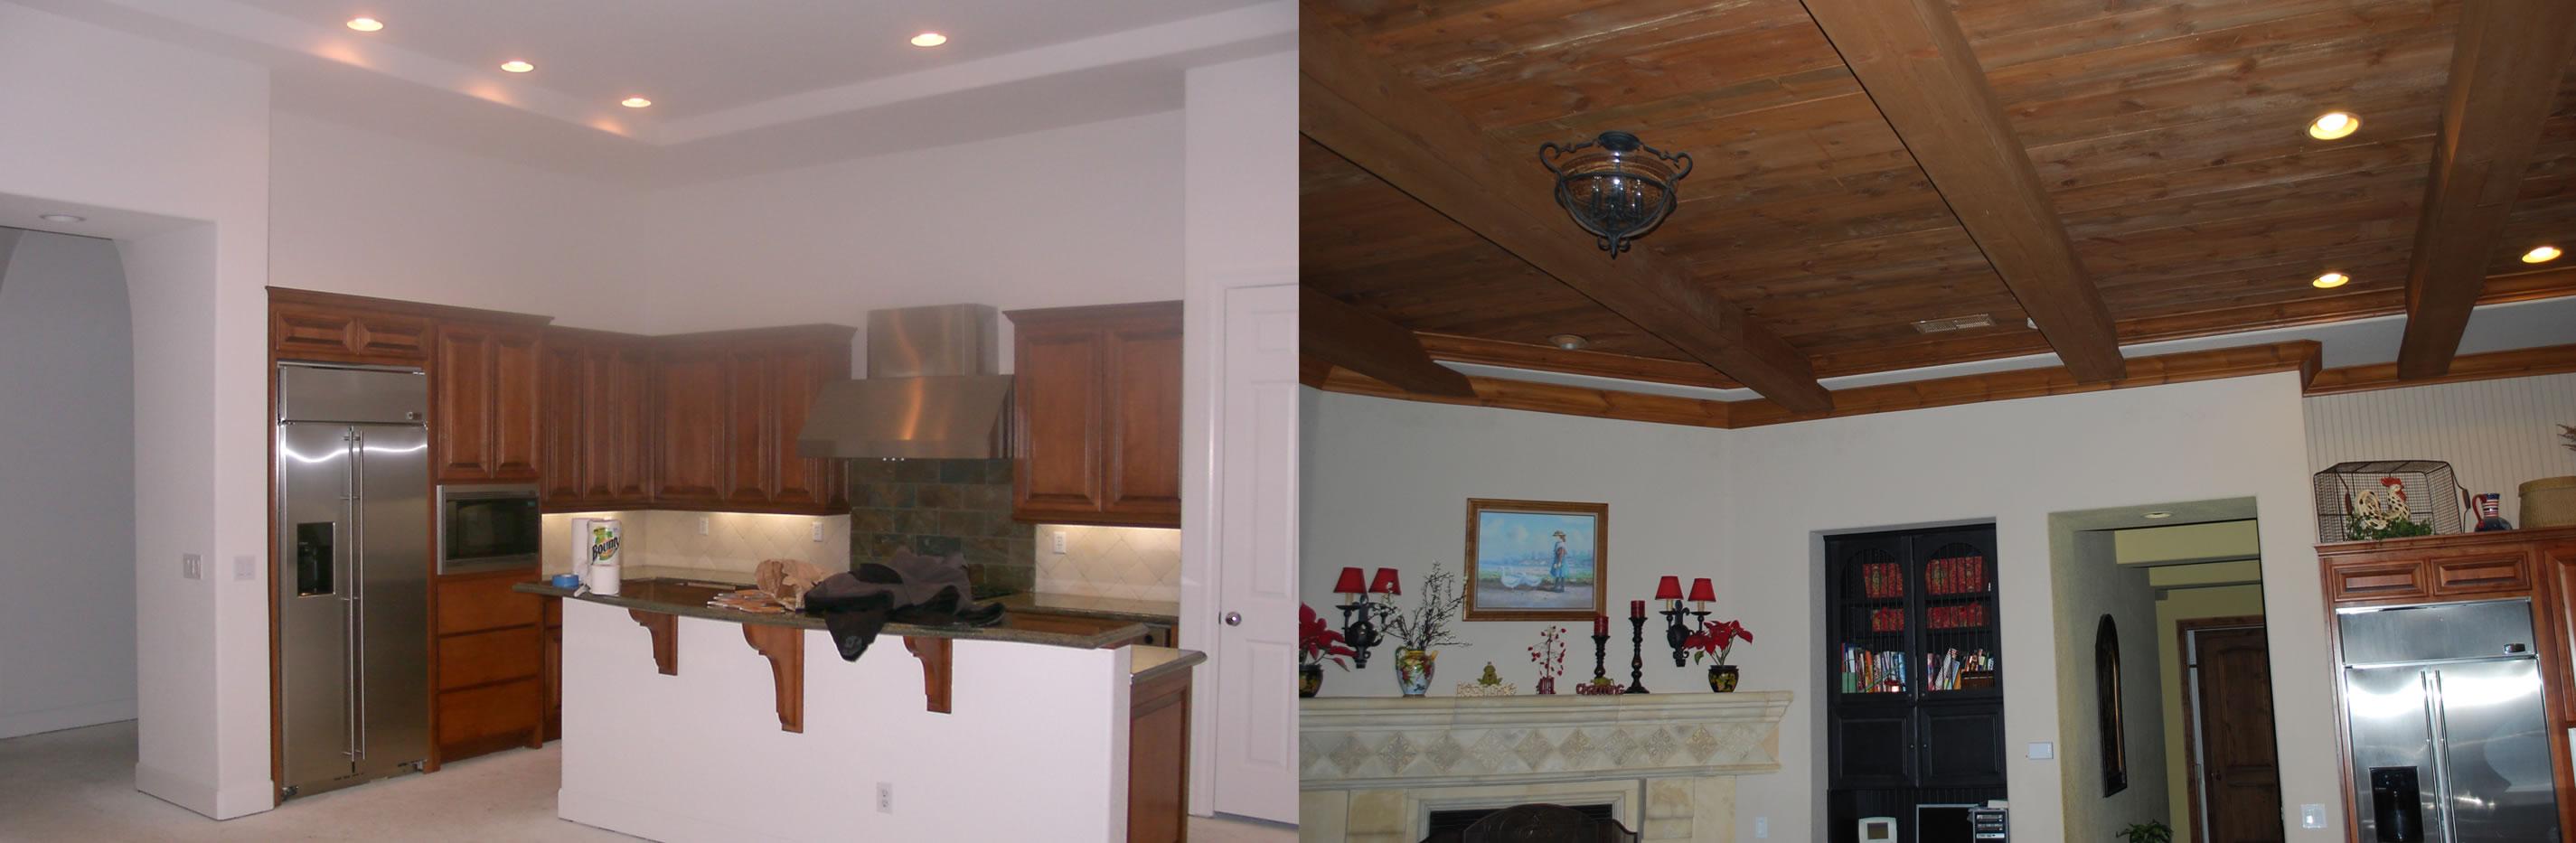 Trimpak Custom Cabinets Cabinet Reface Kitchen